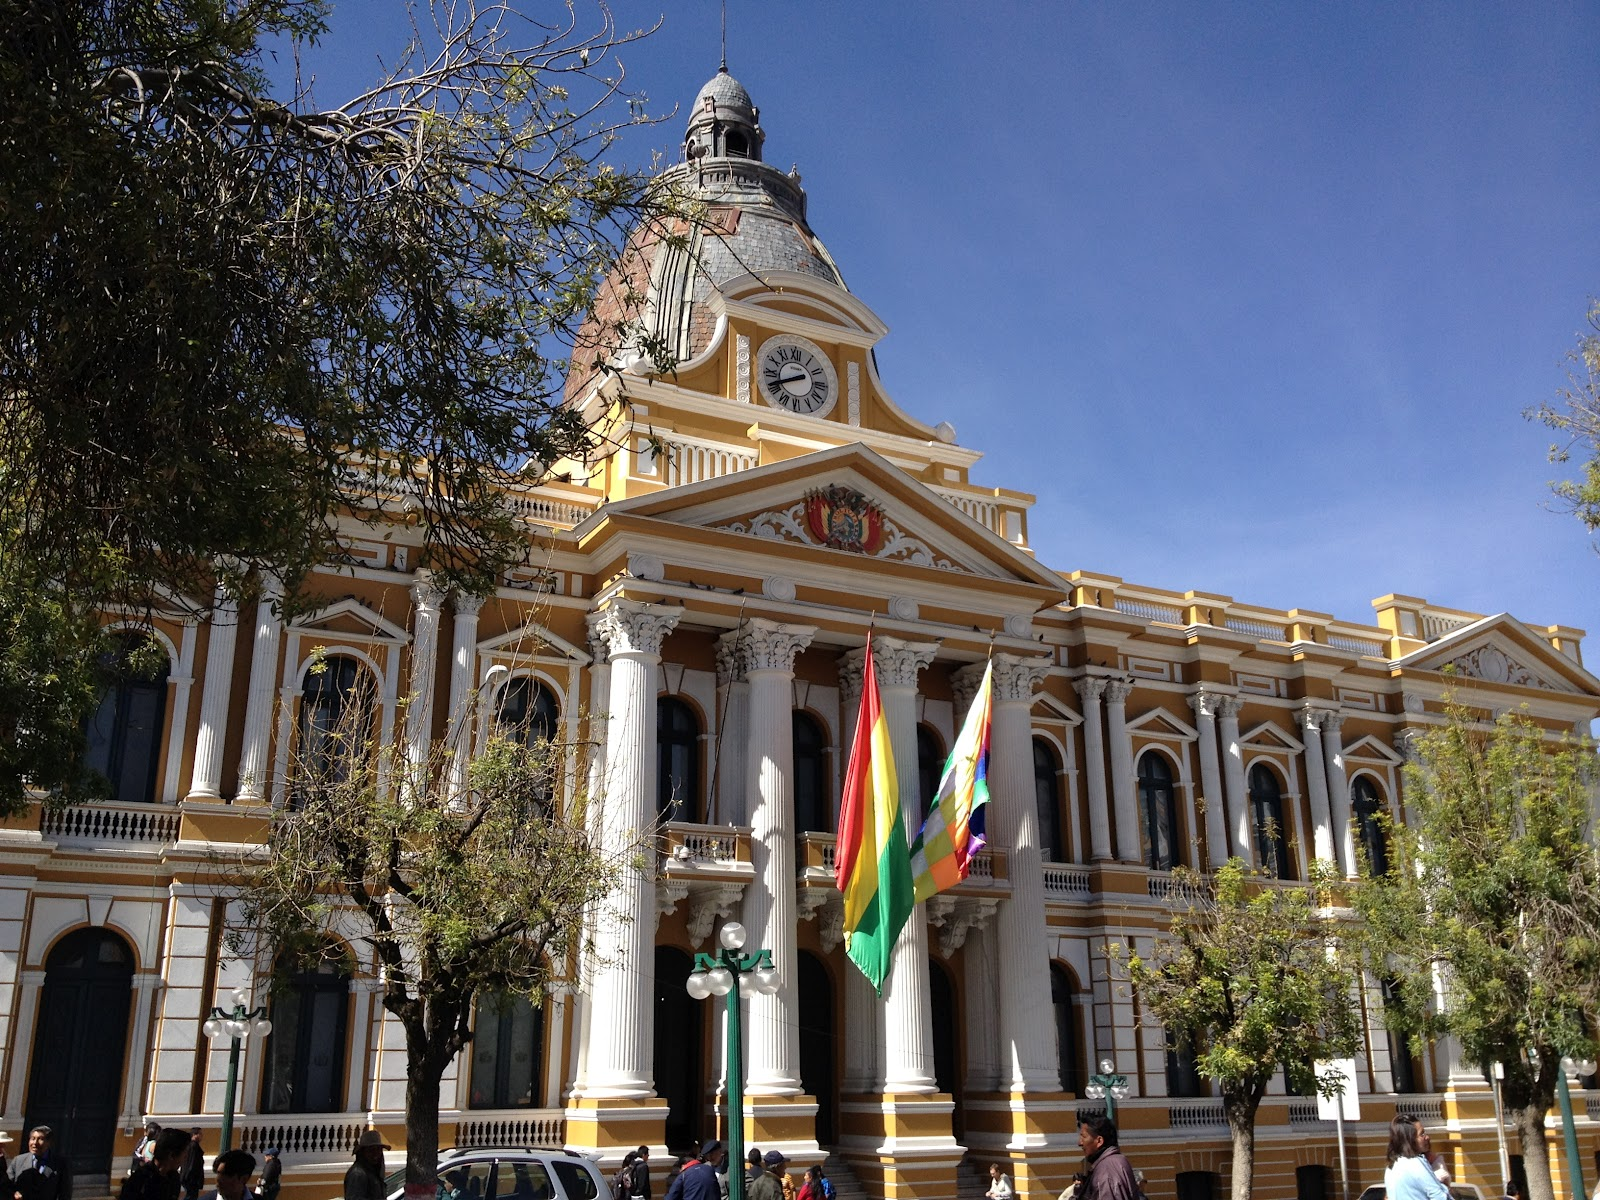 Bolivia en los ojos de Becca: Exploring the City with Jodi